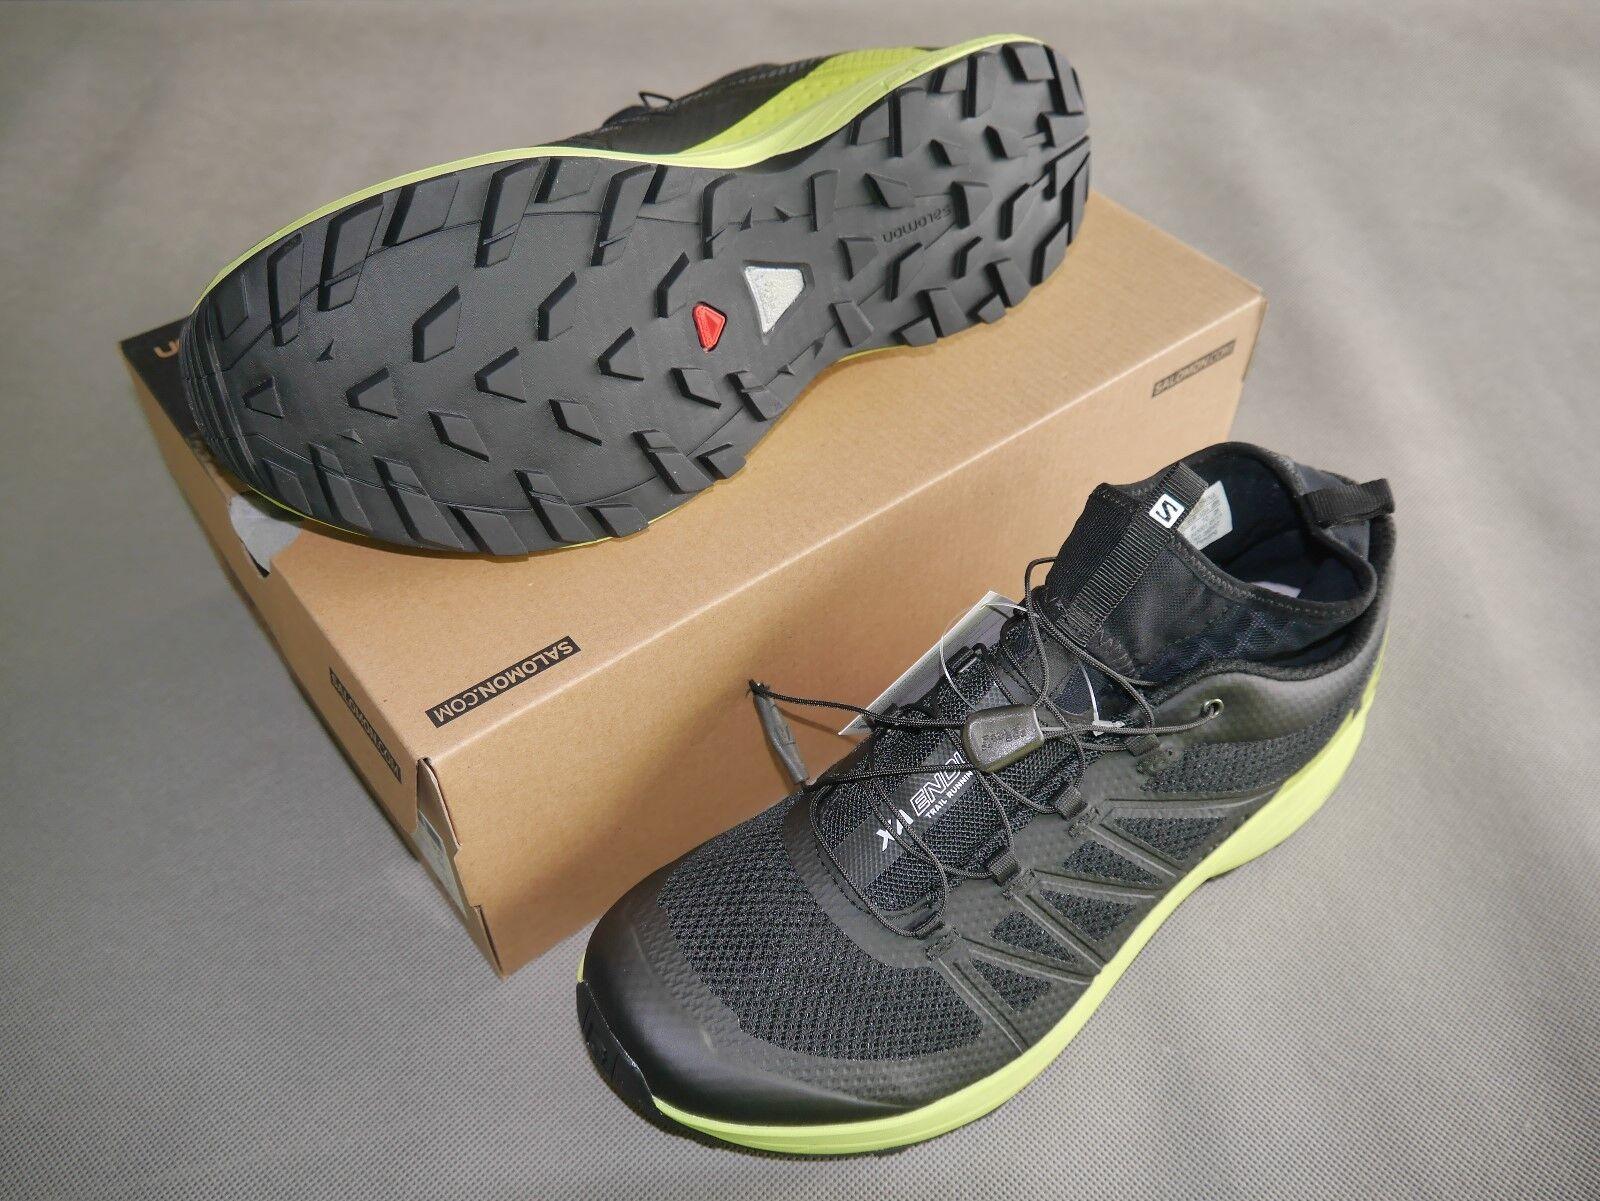 Salomon XA Enduro Trail Running - Gr Gr - 46- UK 11 - NEU (392407) 879391